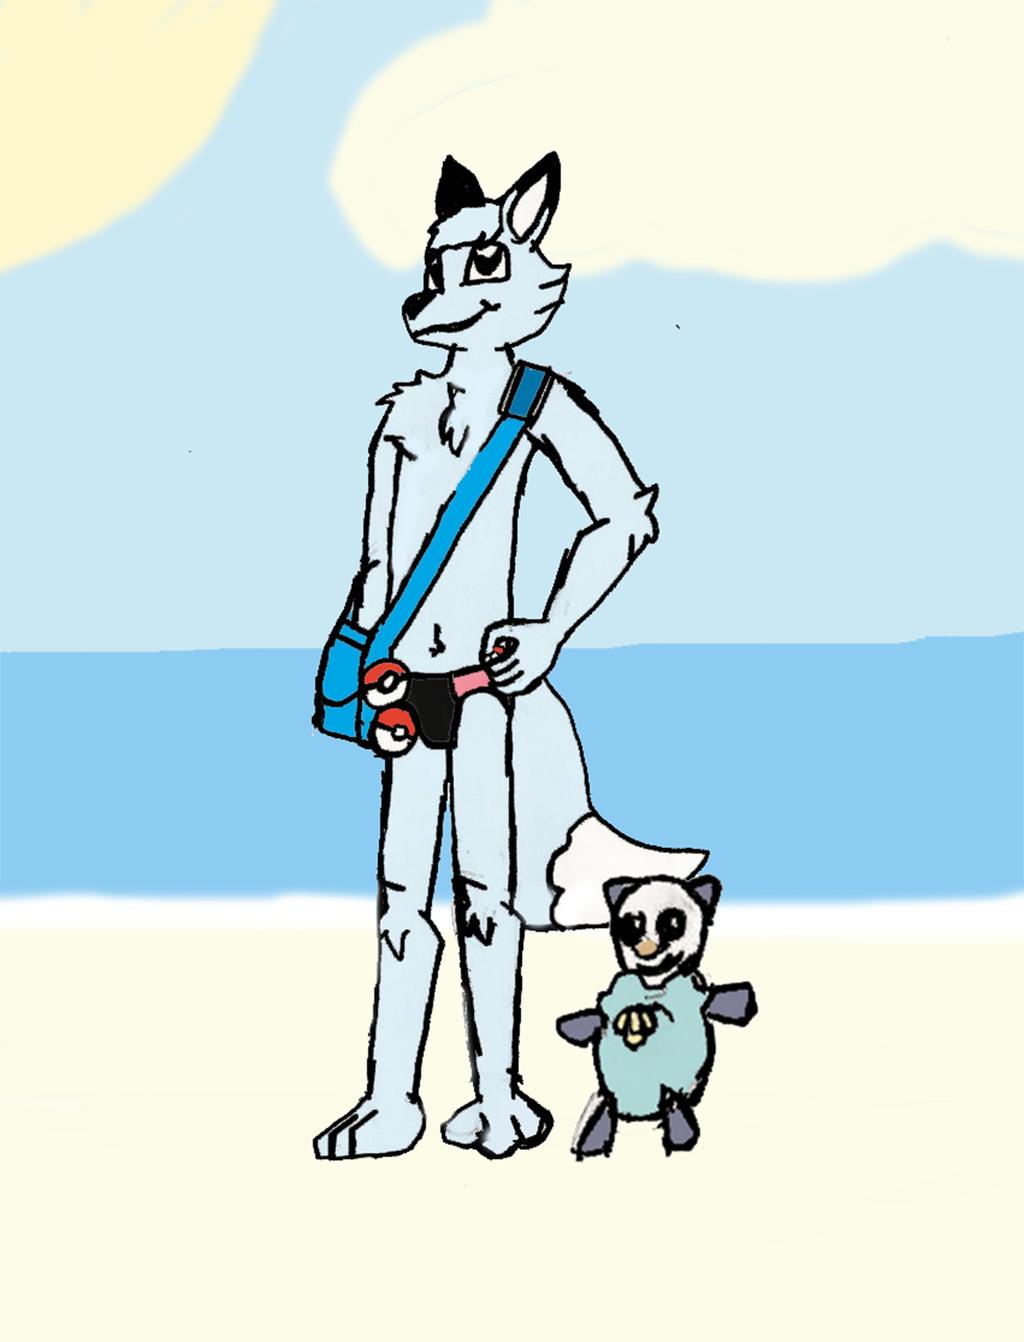 Pokemon Trainer Terry and Oshawott on a Beach